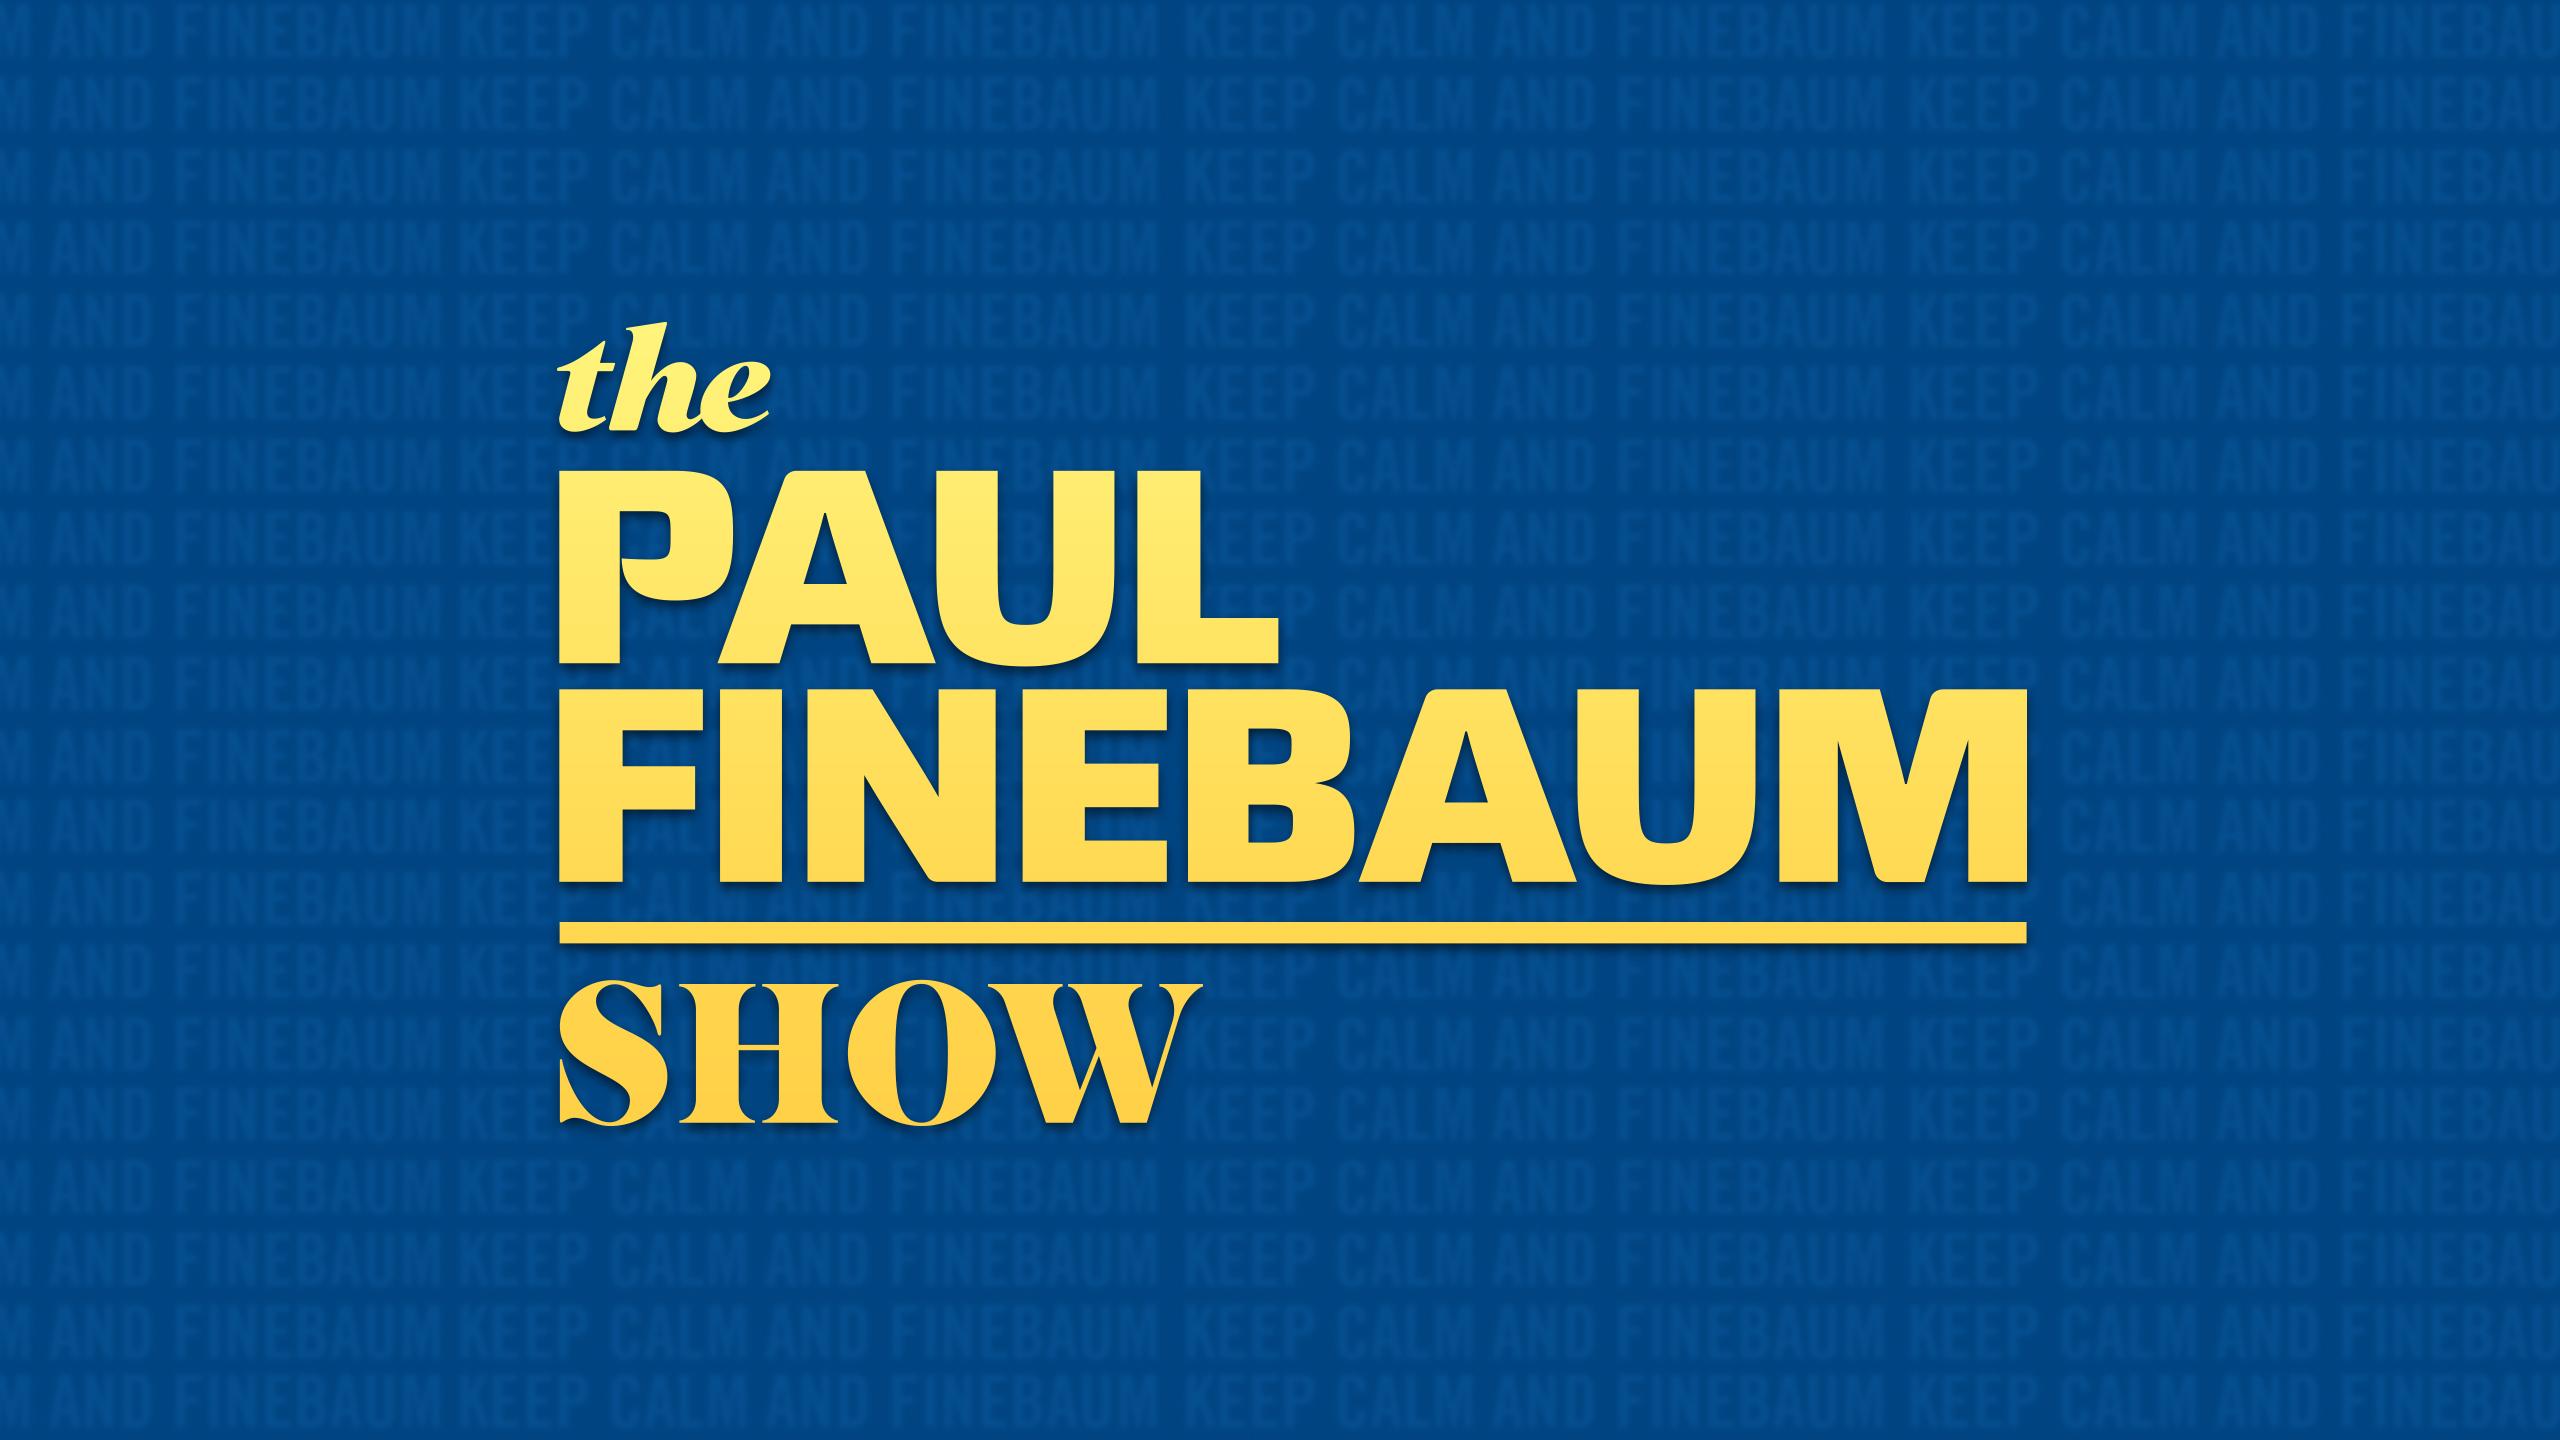 Fri, 12/7 - The Paul Finebaum Show